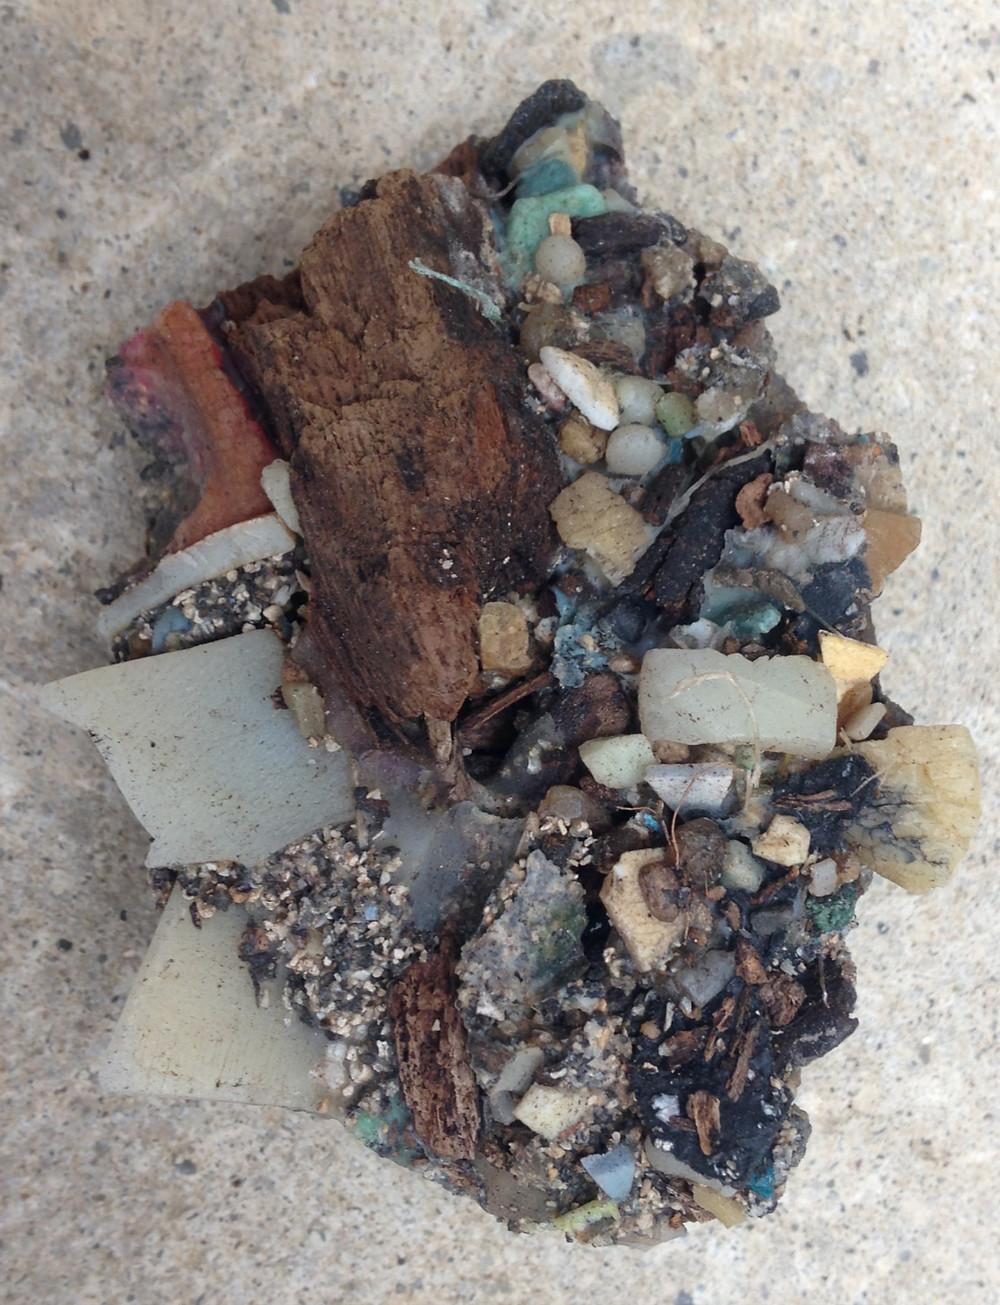 Plastiglomerate from Kamilo Beach, Hawaii. Photo by Patricia Corcoran, University of Western Ontario